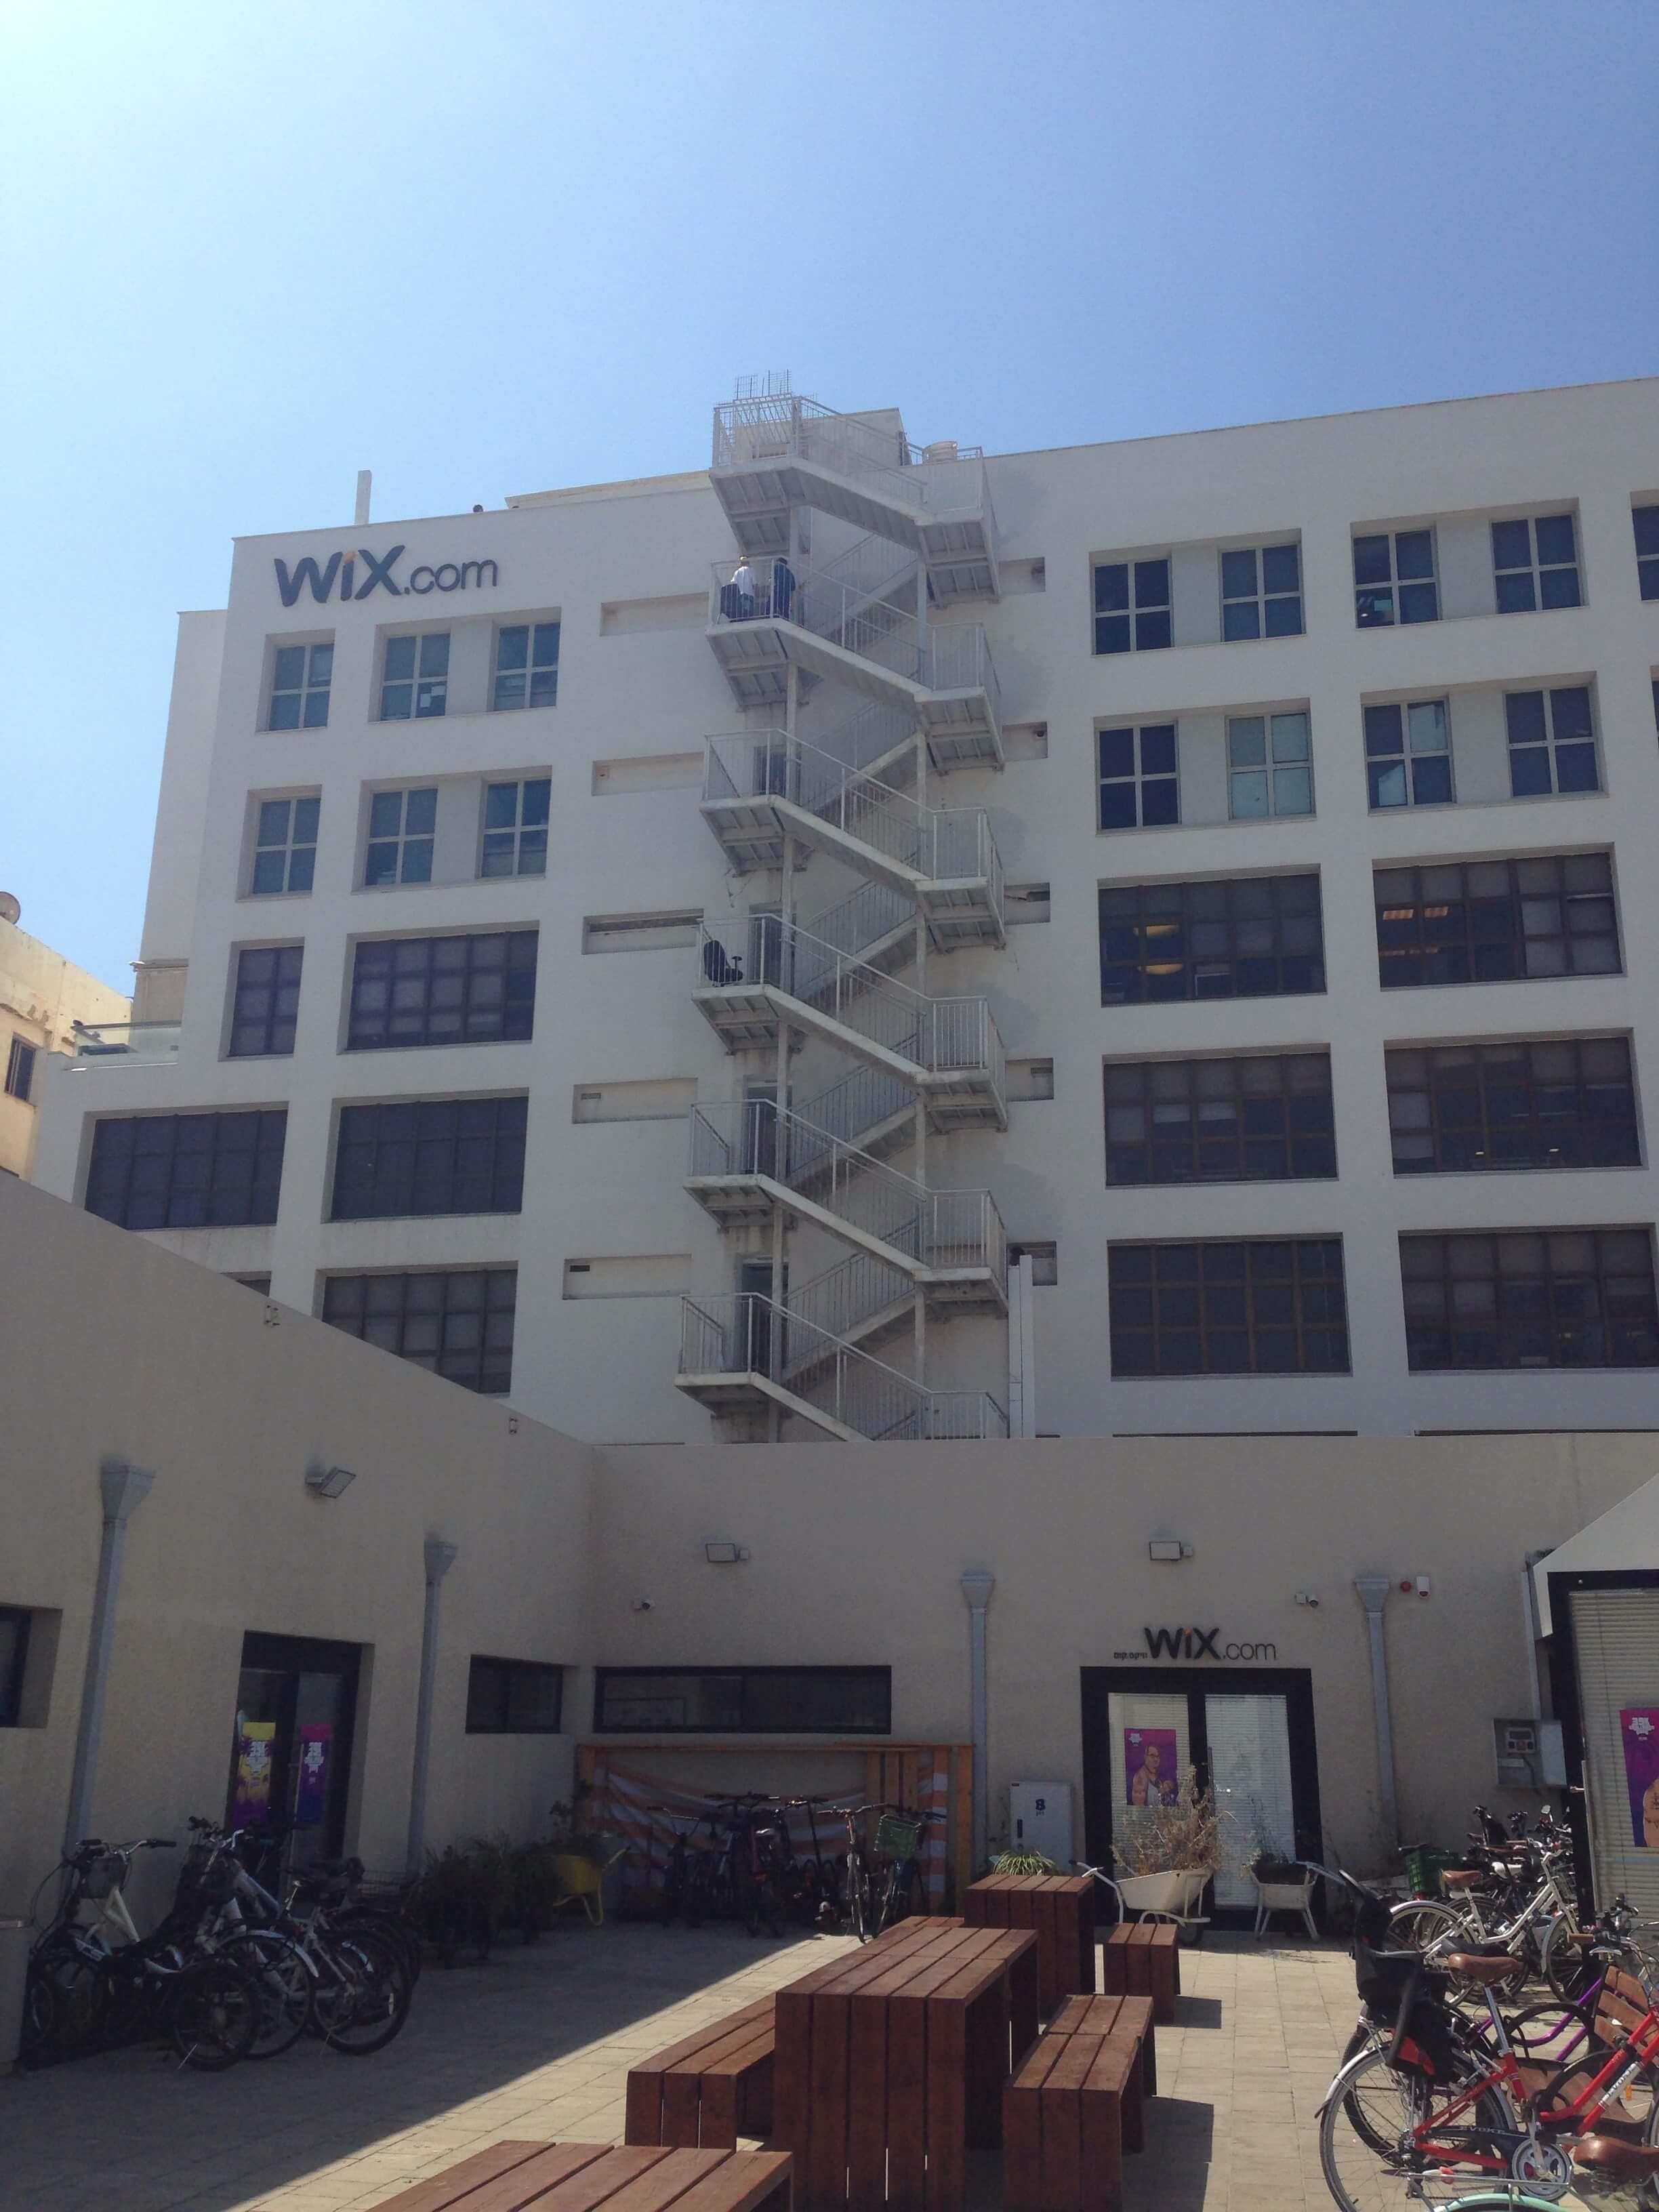 Wix com - Wikipedia